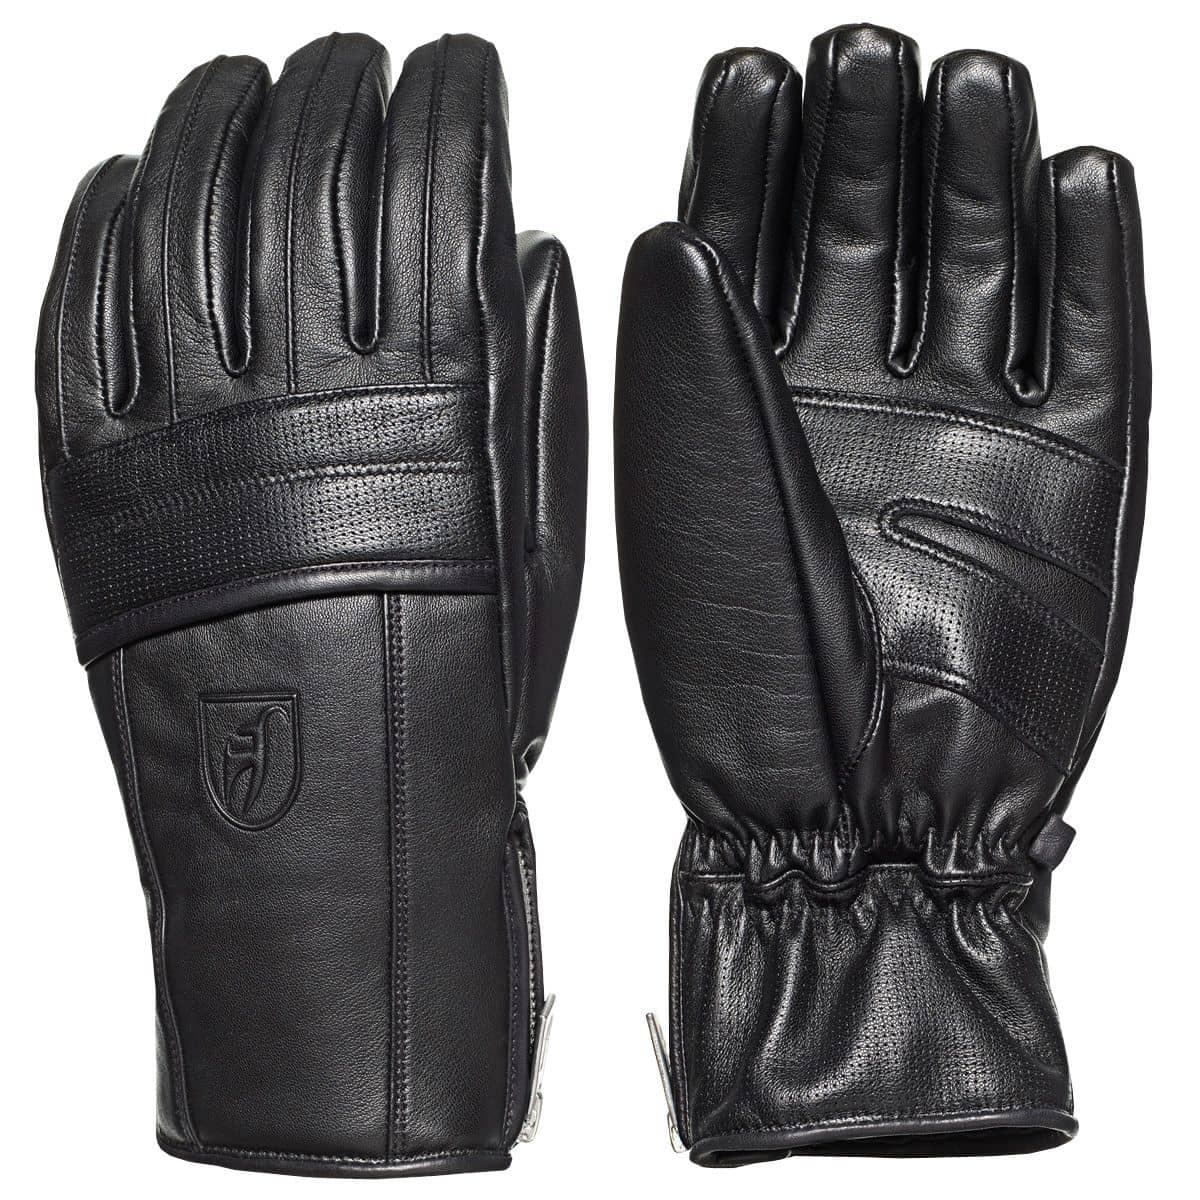 Toni Sailer Jace Glove black